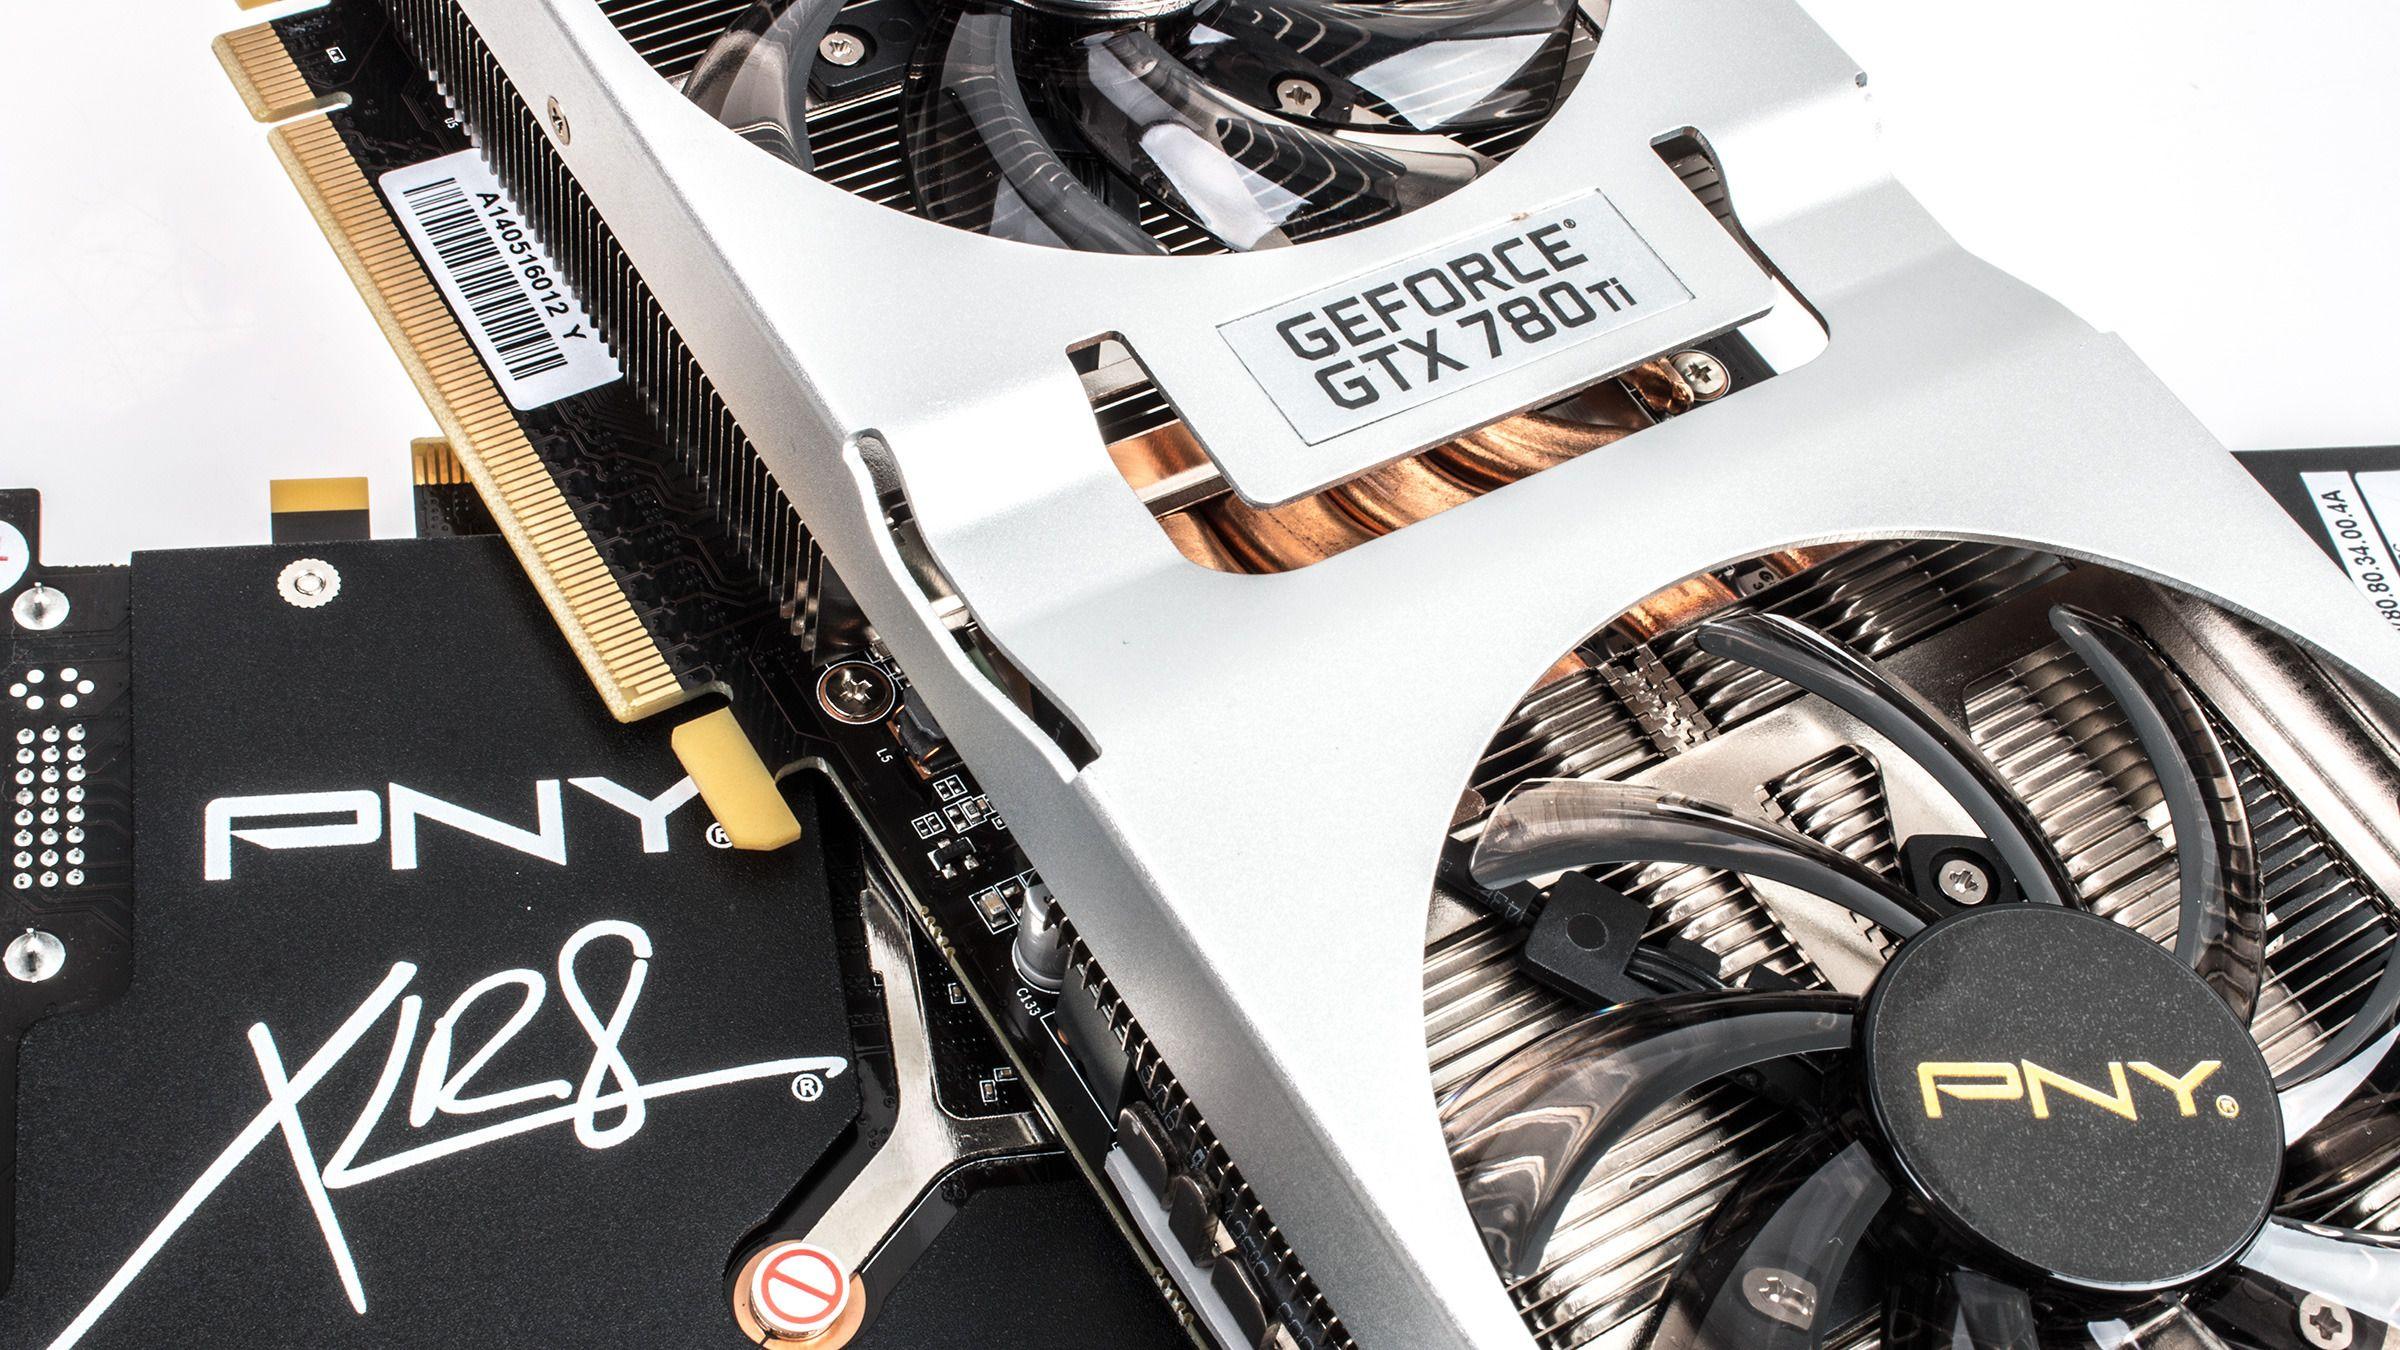 PNY XLR8 GeForce GTX 780 Ti PP SLI